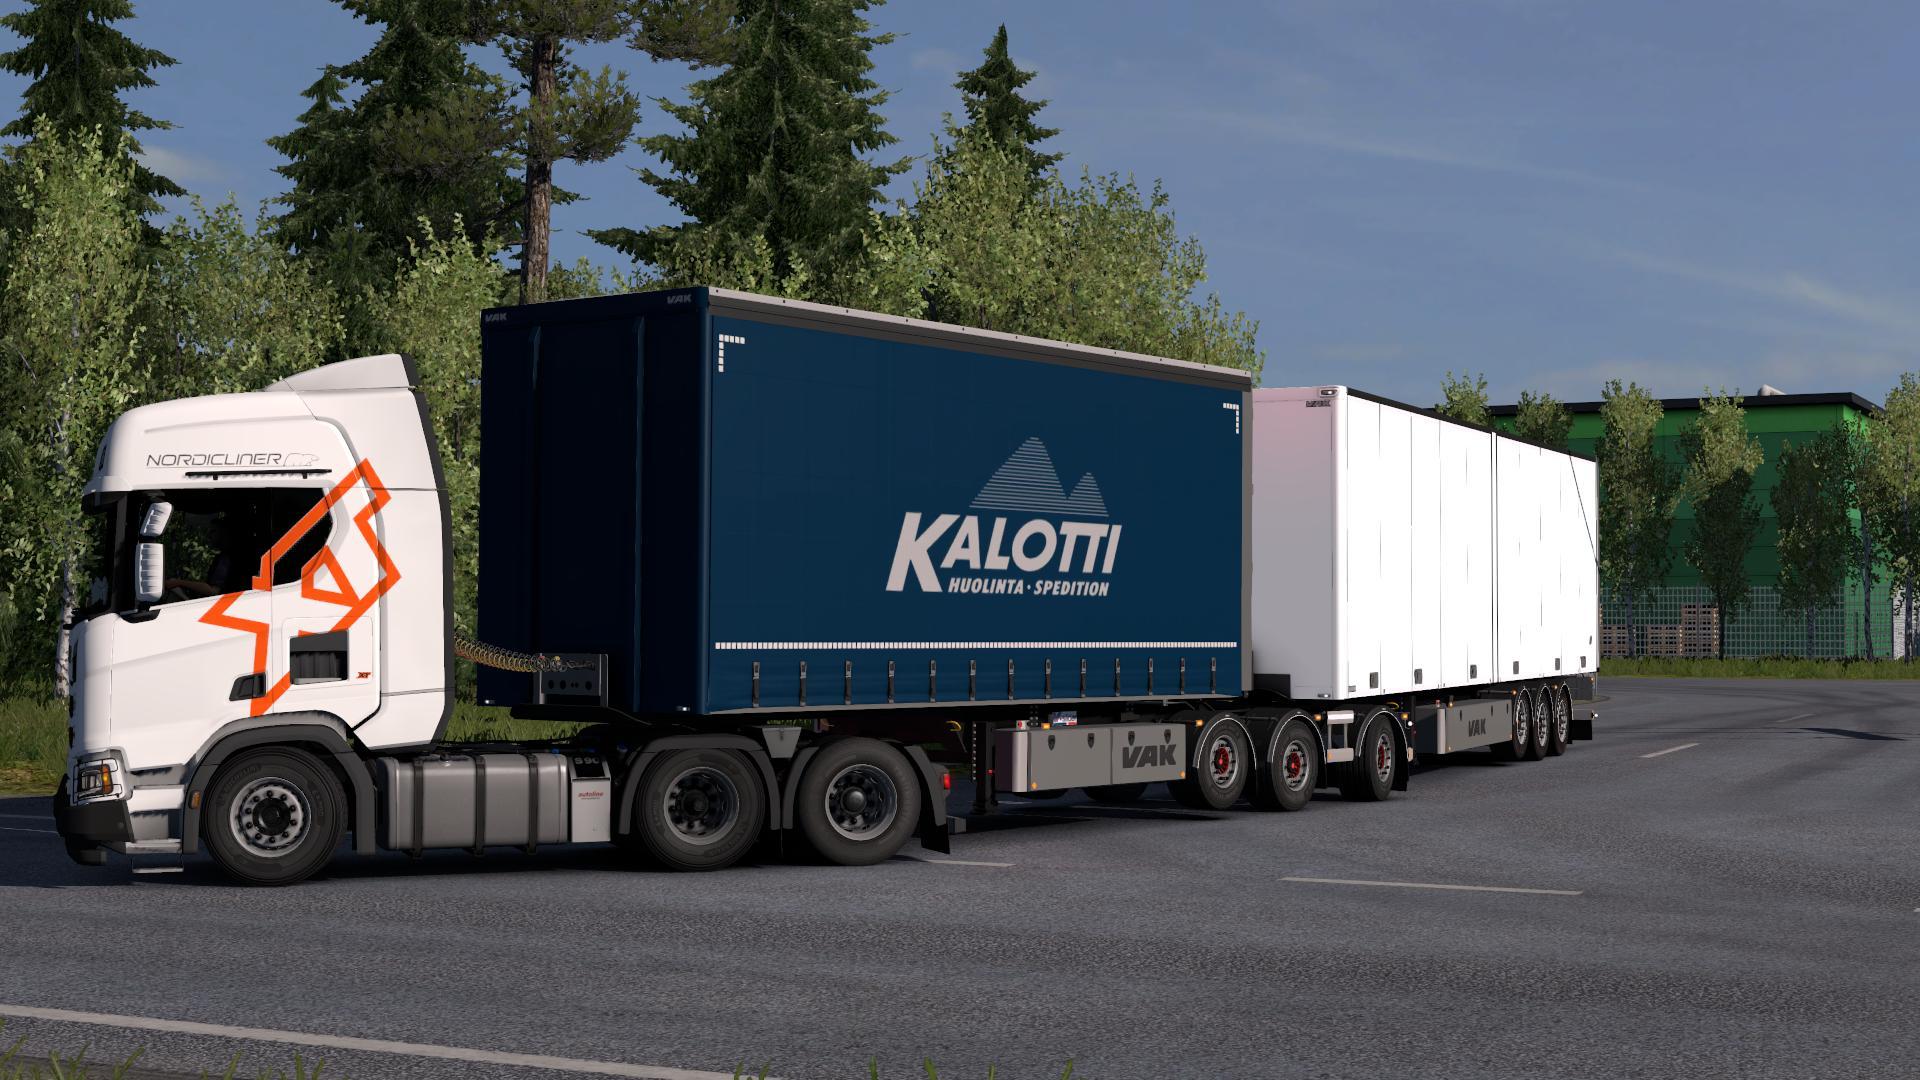 VAK TRAILERS V1.1 1.32.X ETS2 -Euro Truck Simulator 2 Mods